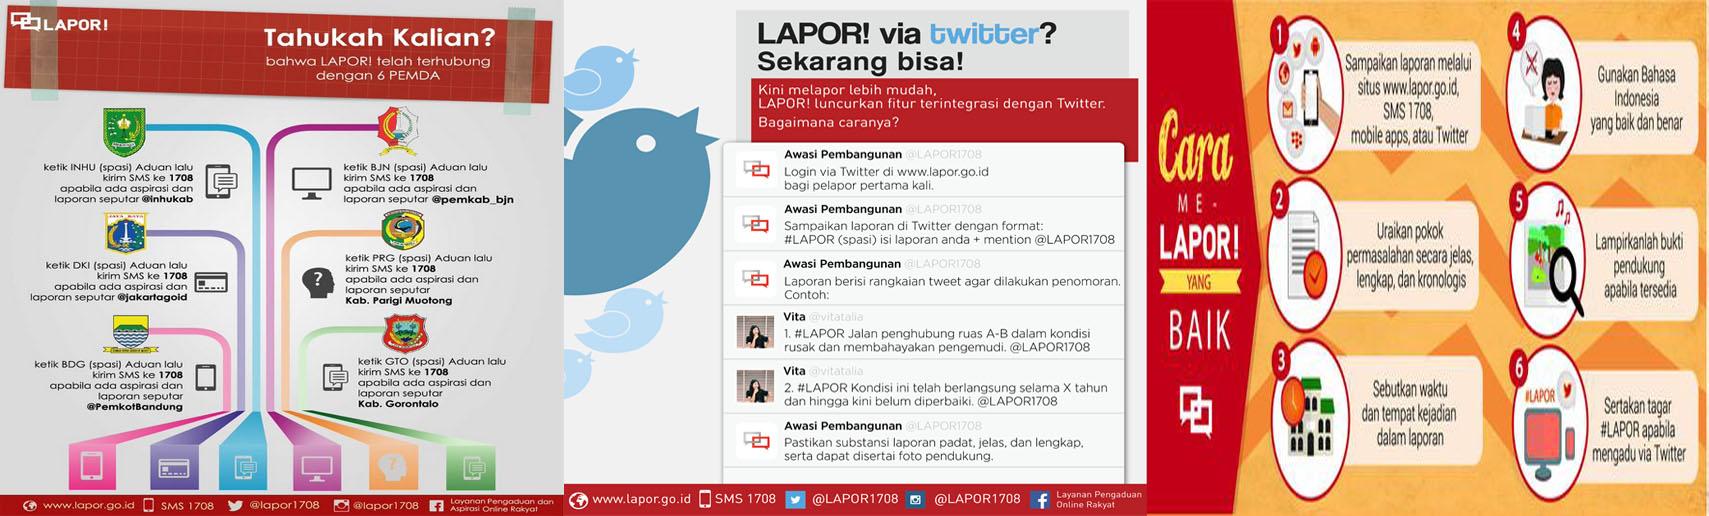 LAPOR via Twitter<BR>Cara Melapor yang Baik